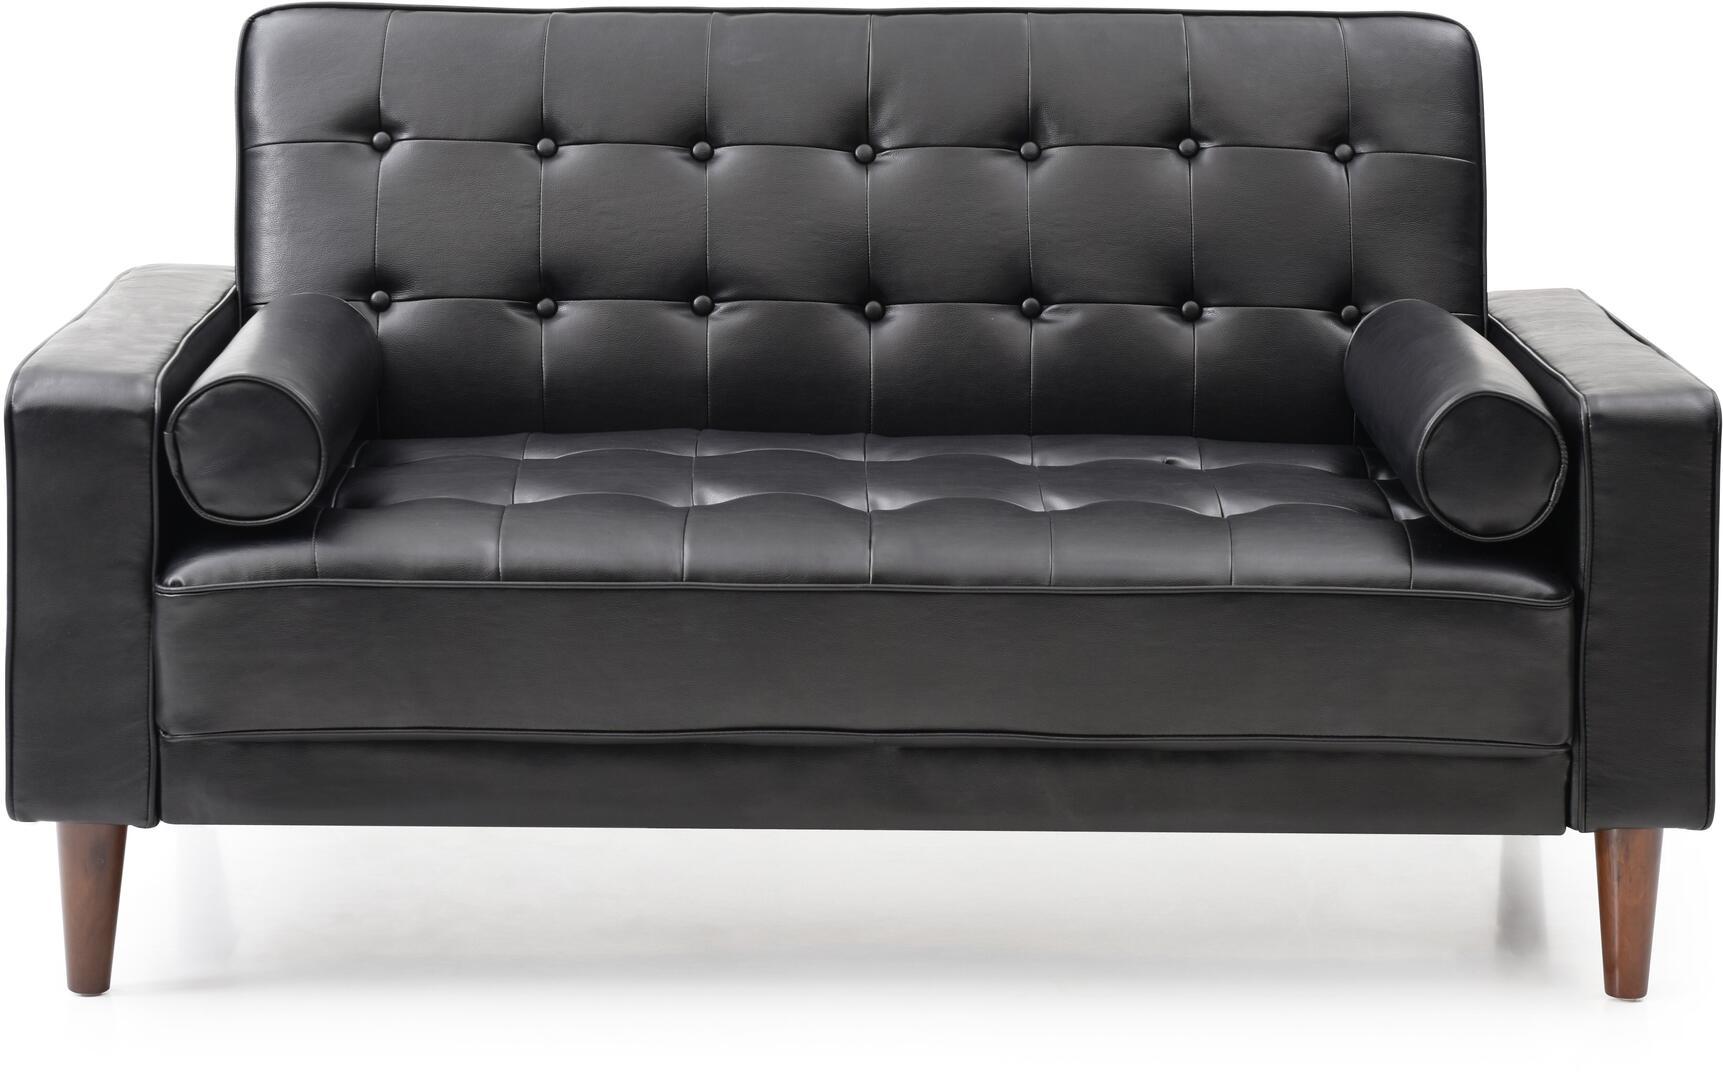 Glory Furniture G843al Navi Series Loveseat Sleeper Faux Leather